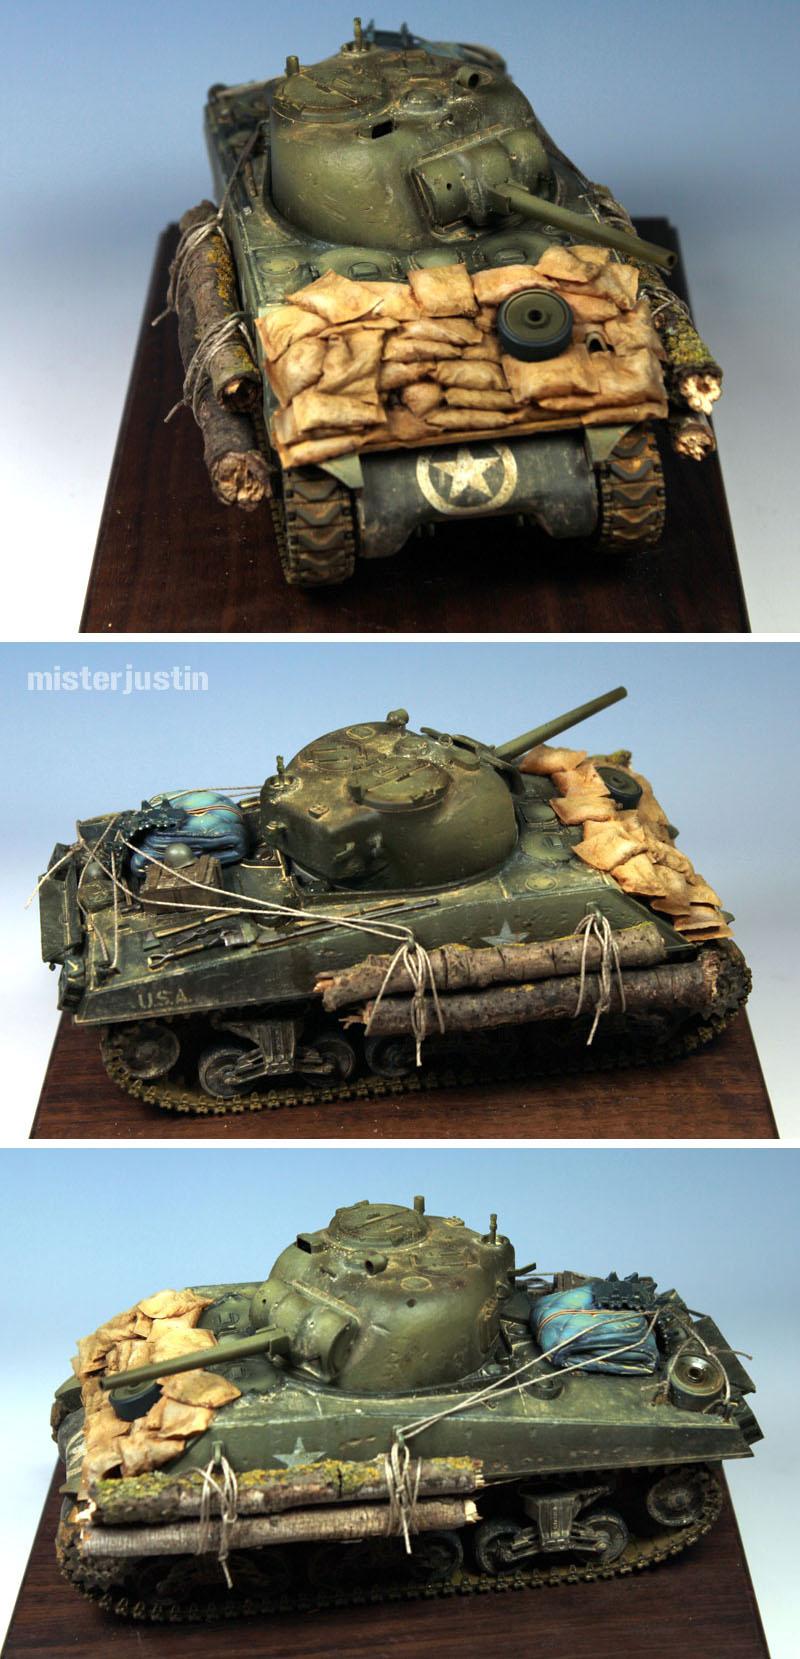 CoolMiniOrNot - 1/35 Sherman M4A3 by misterjustin